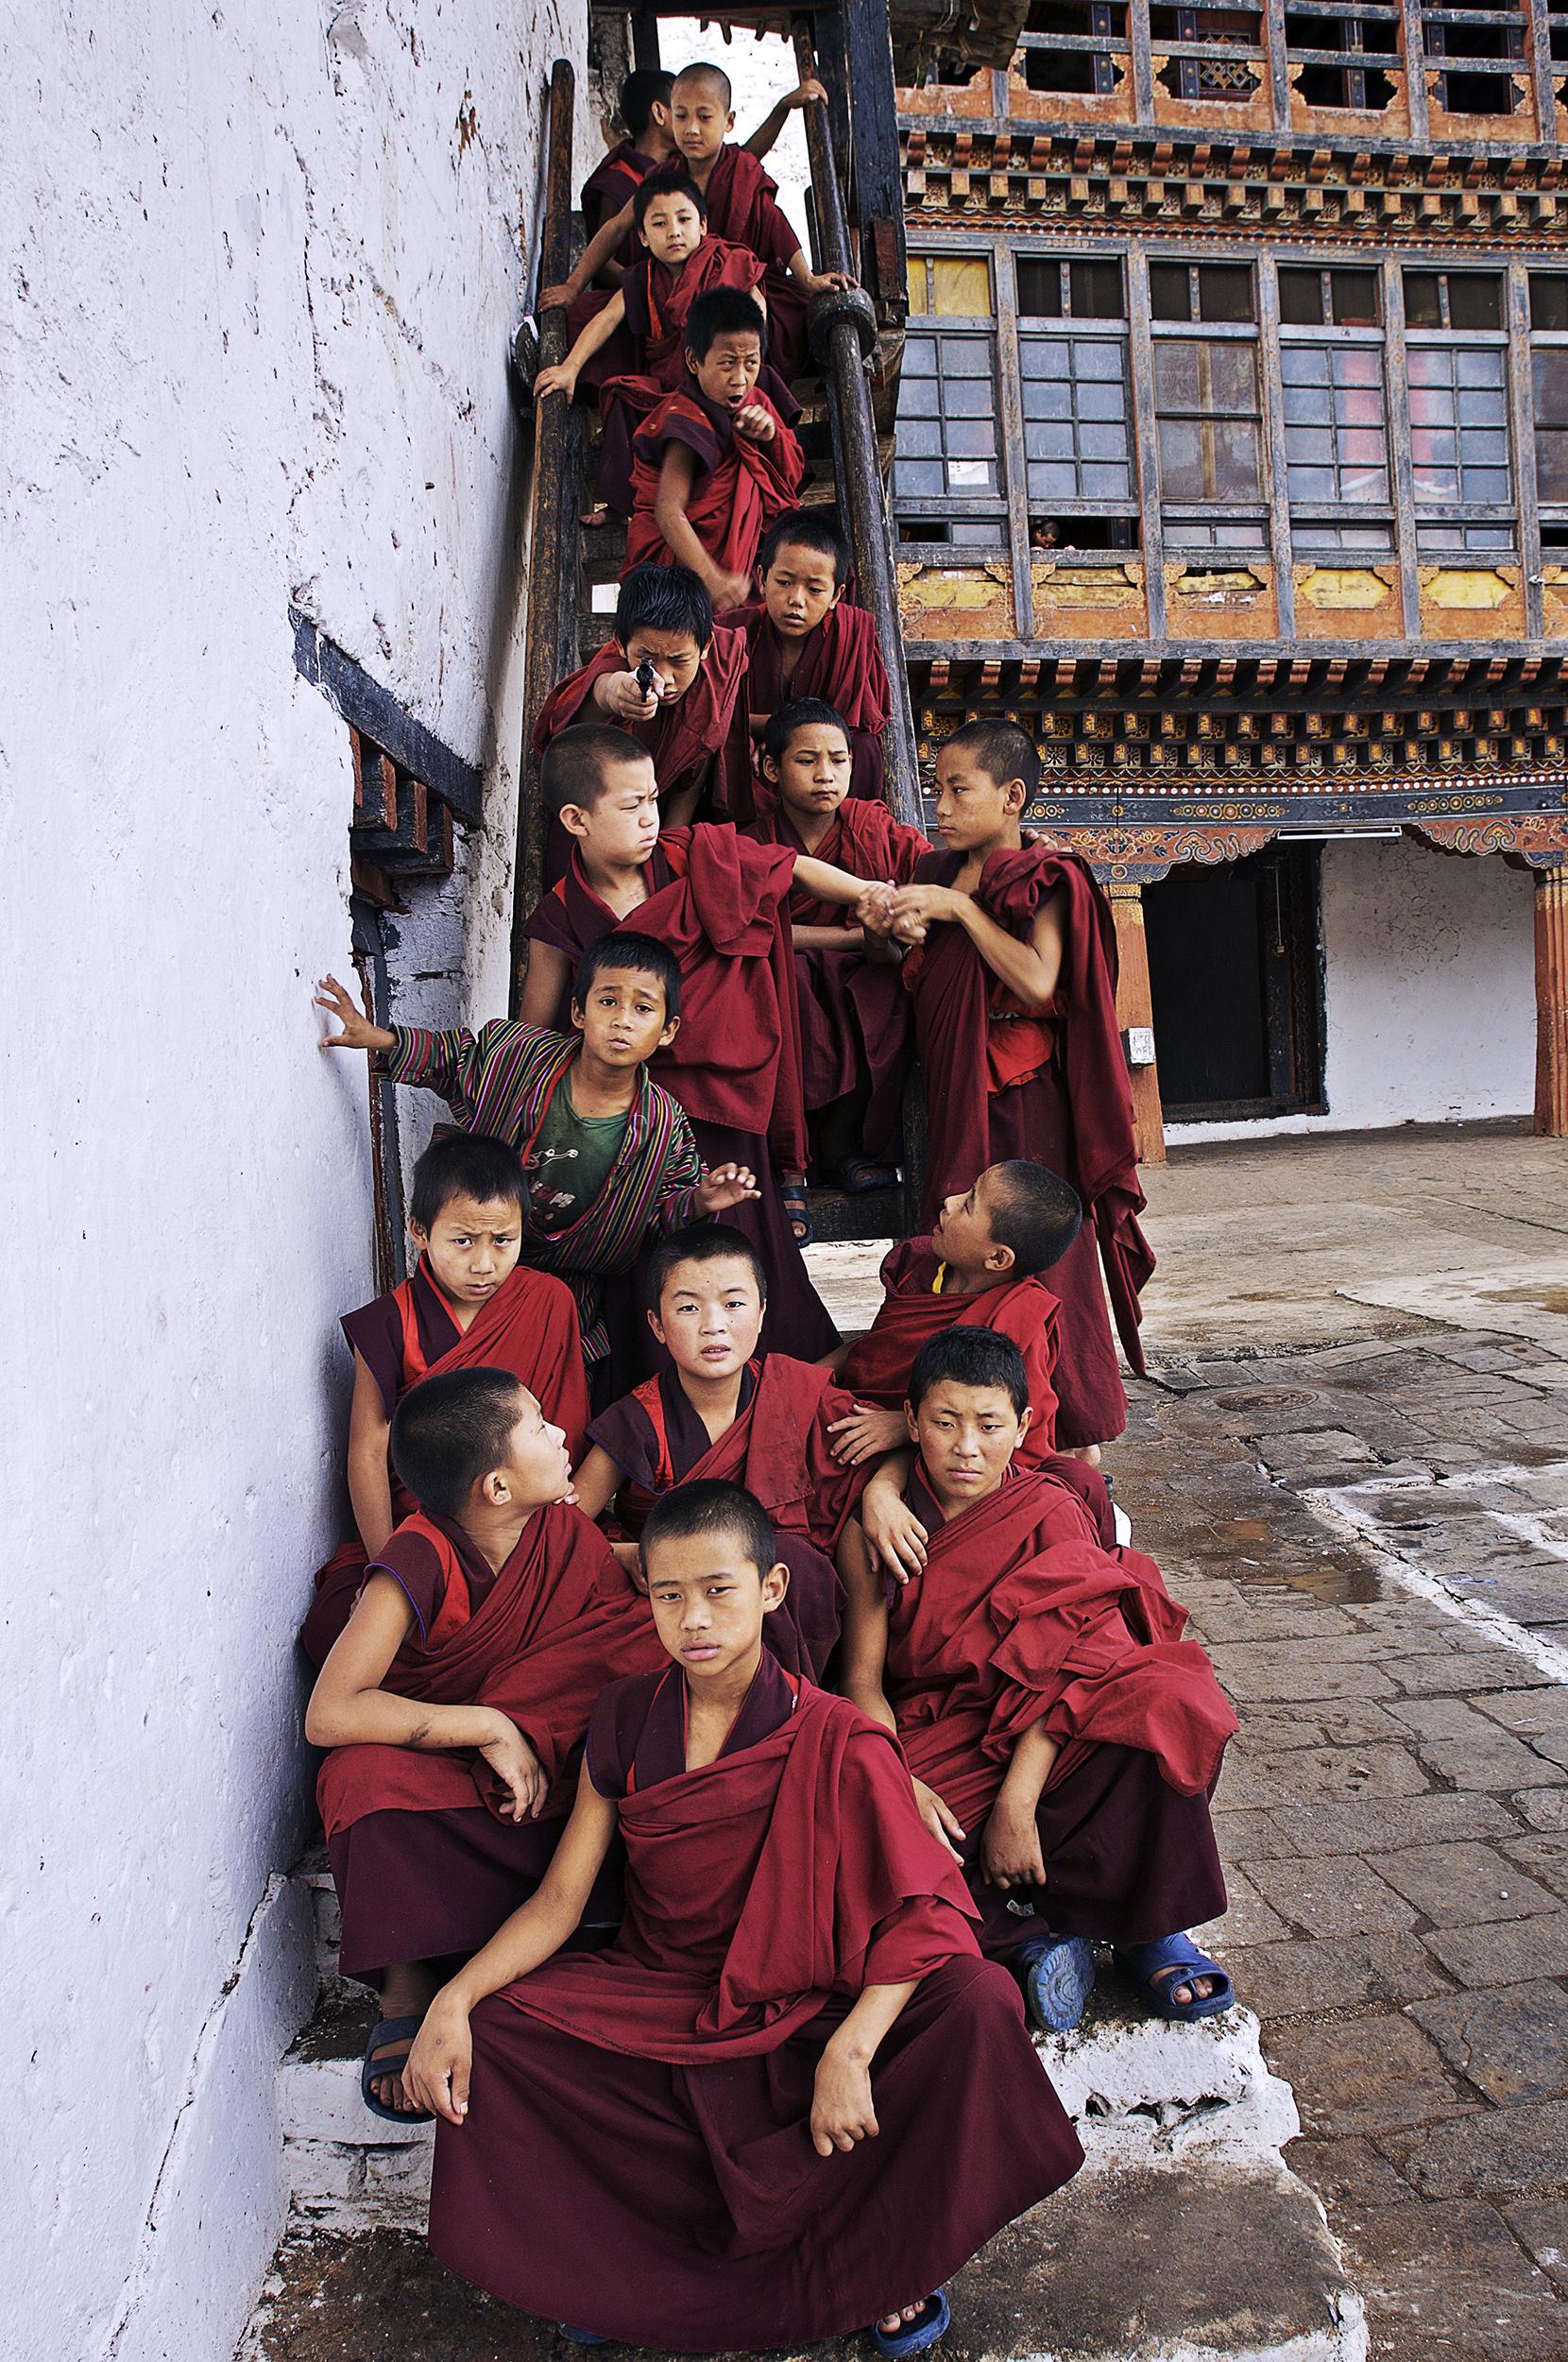 Web_Bhutan 2007 _ Monks on stairs.jpg